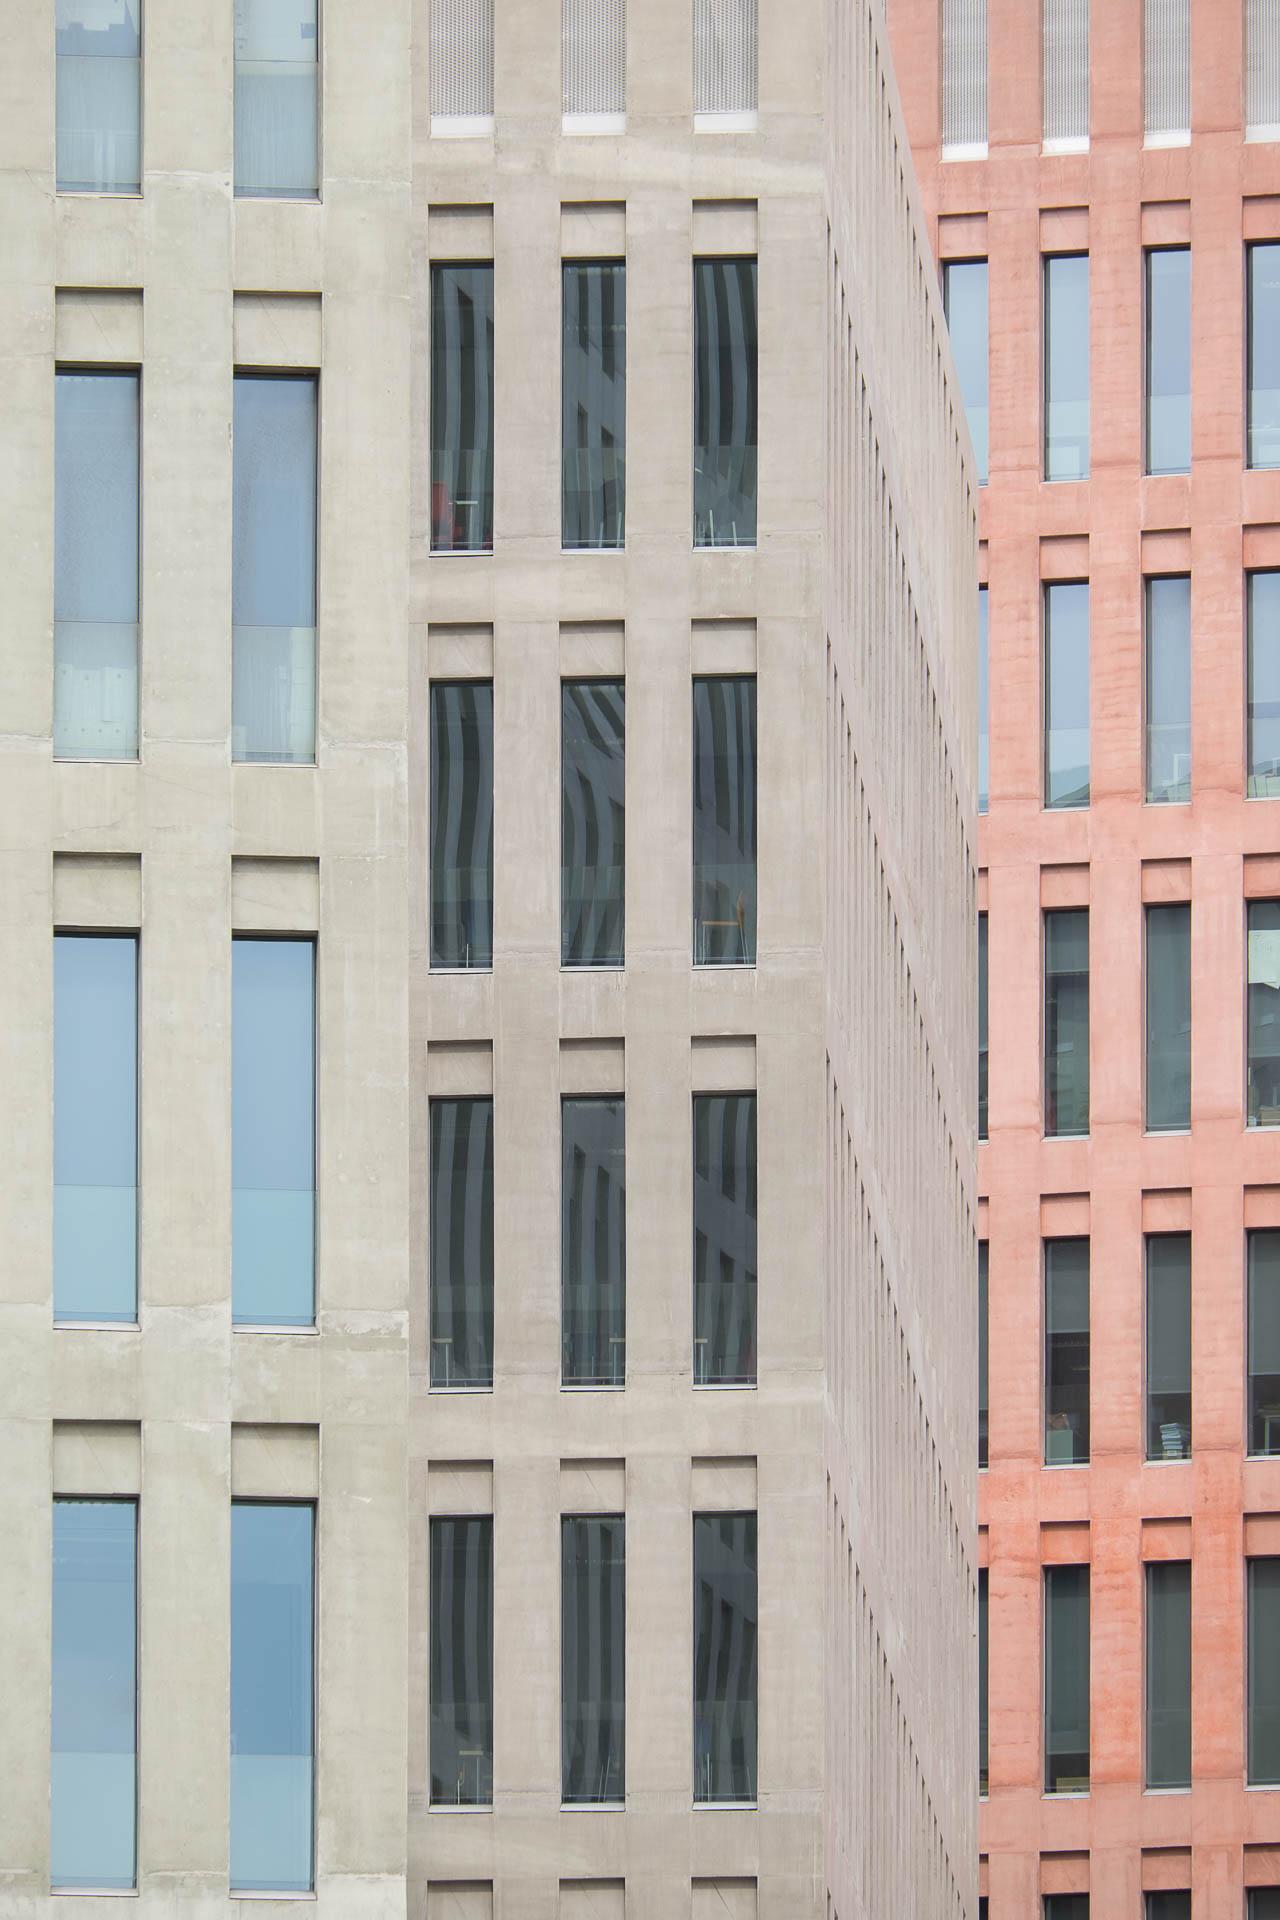 Ciutat de la Justicia Hospitalet - David Chipperfield + b720 Fermín Vázquez - Manolo Espaliú - Fotografía de Arquitectura